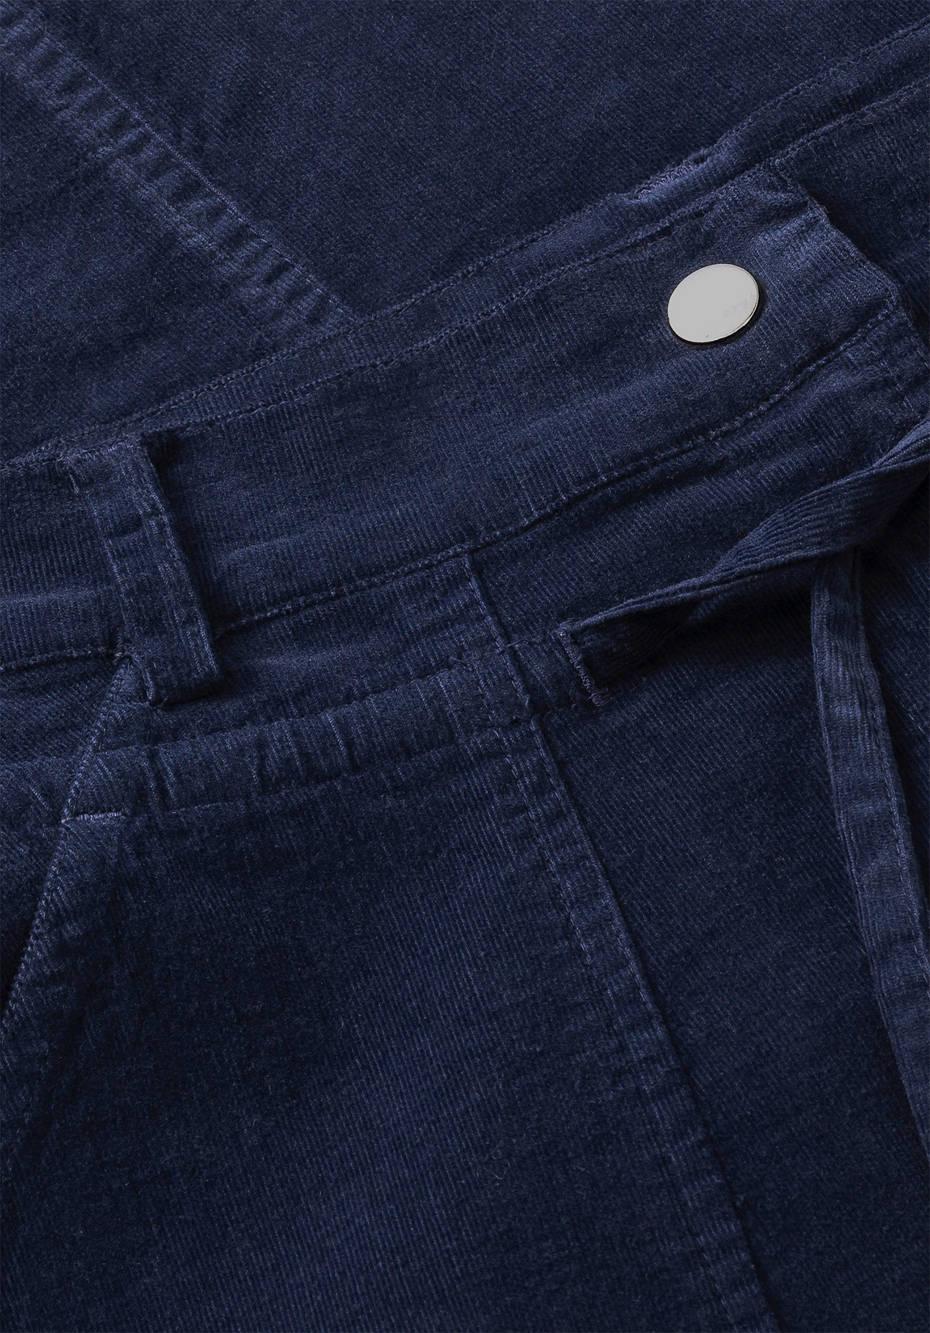 Cord skirt made of organic cotton with hemp